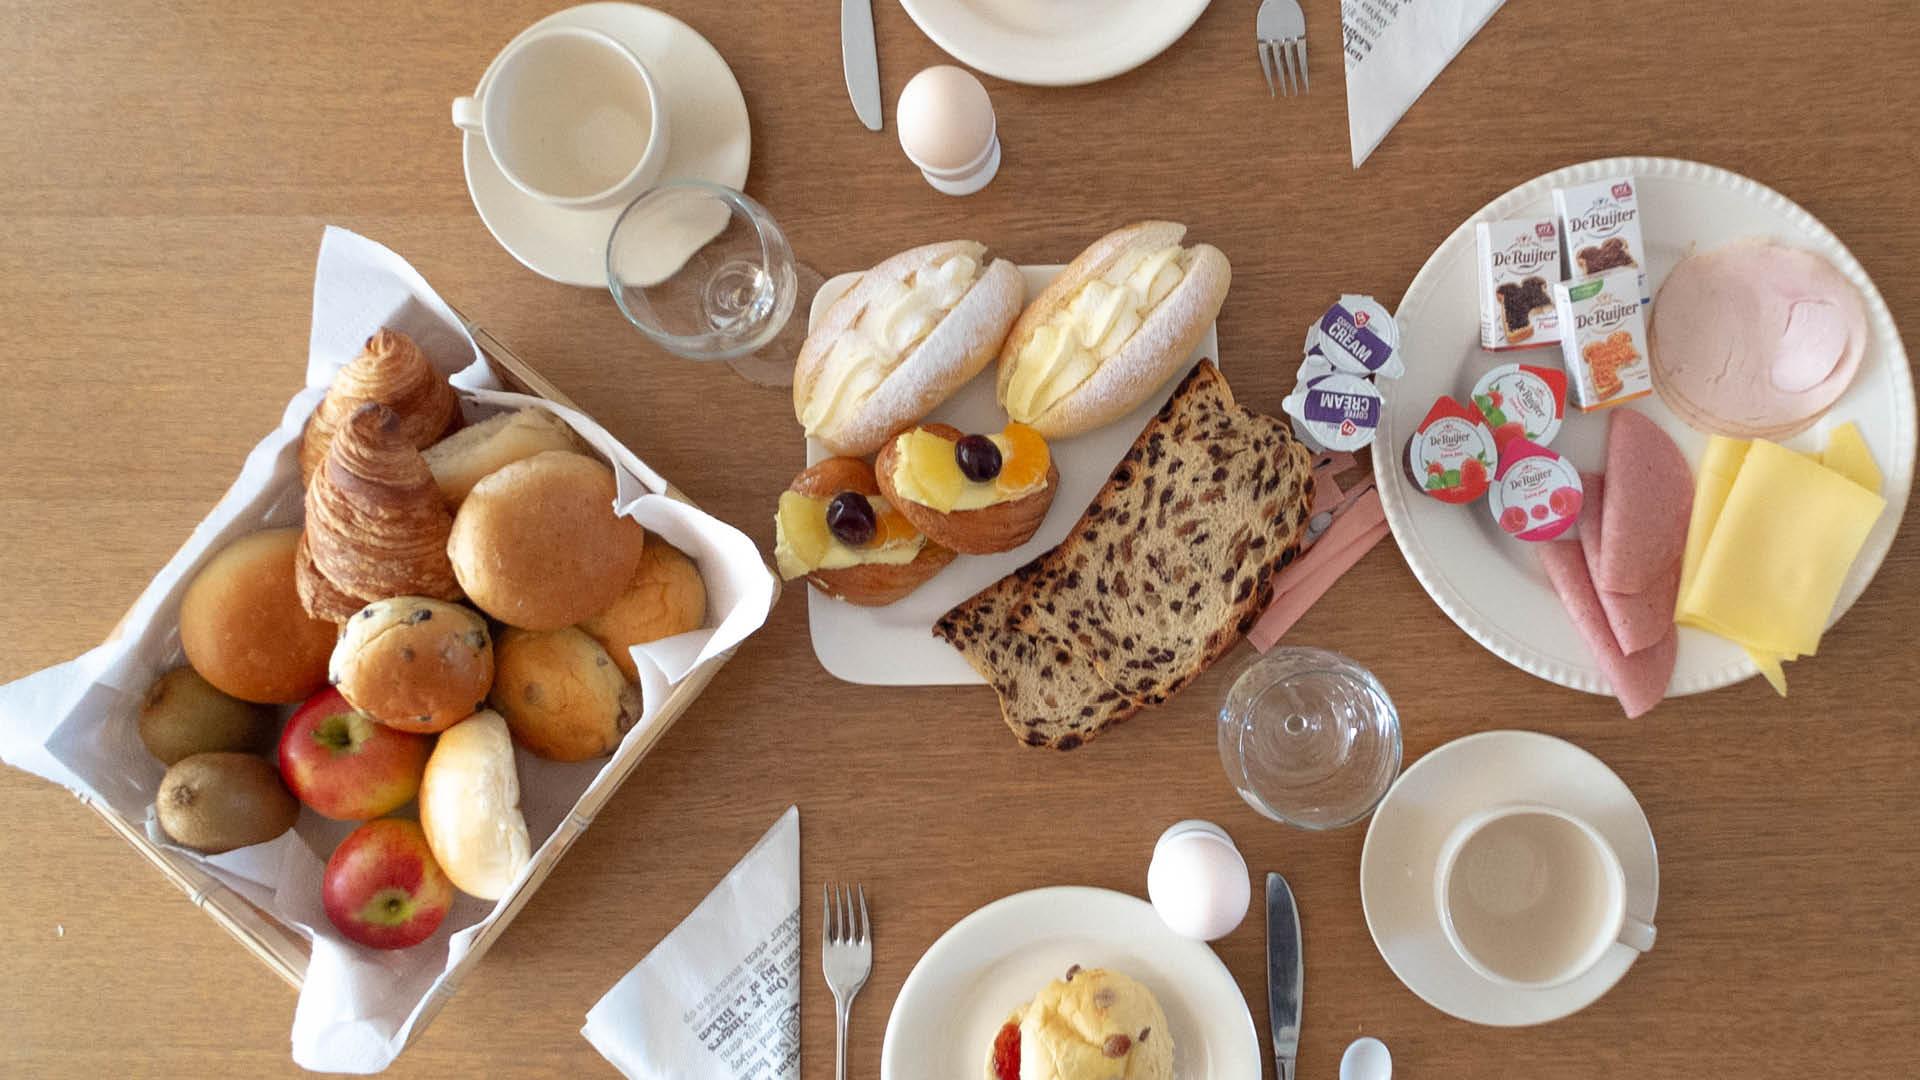 Slider ontbijtservice6